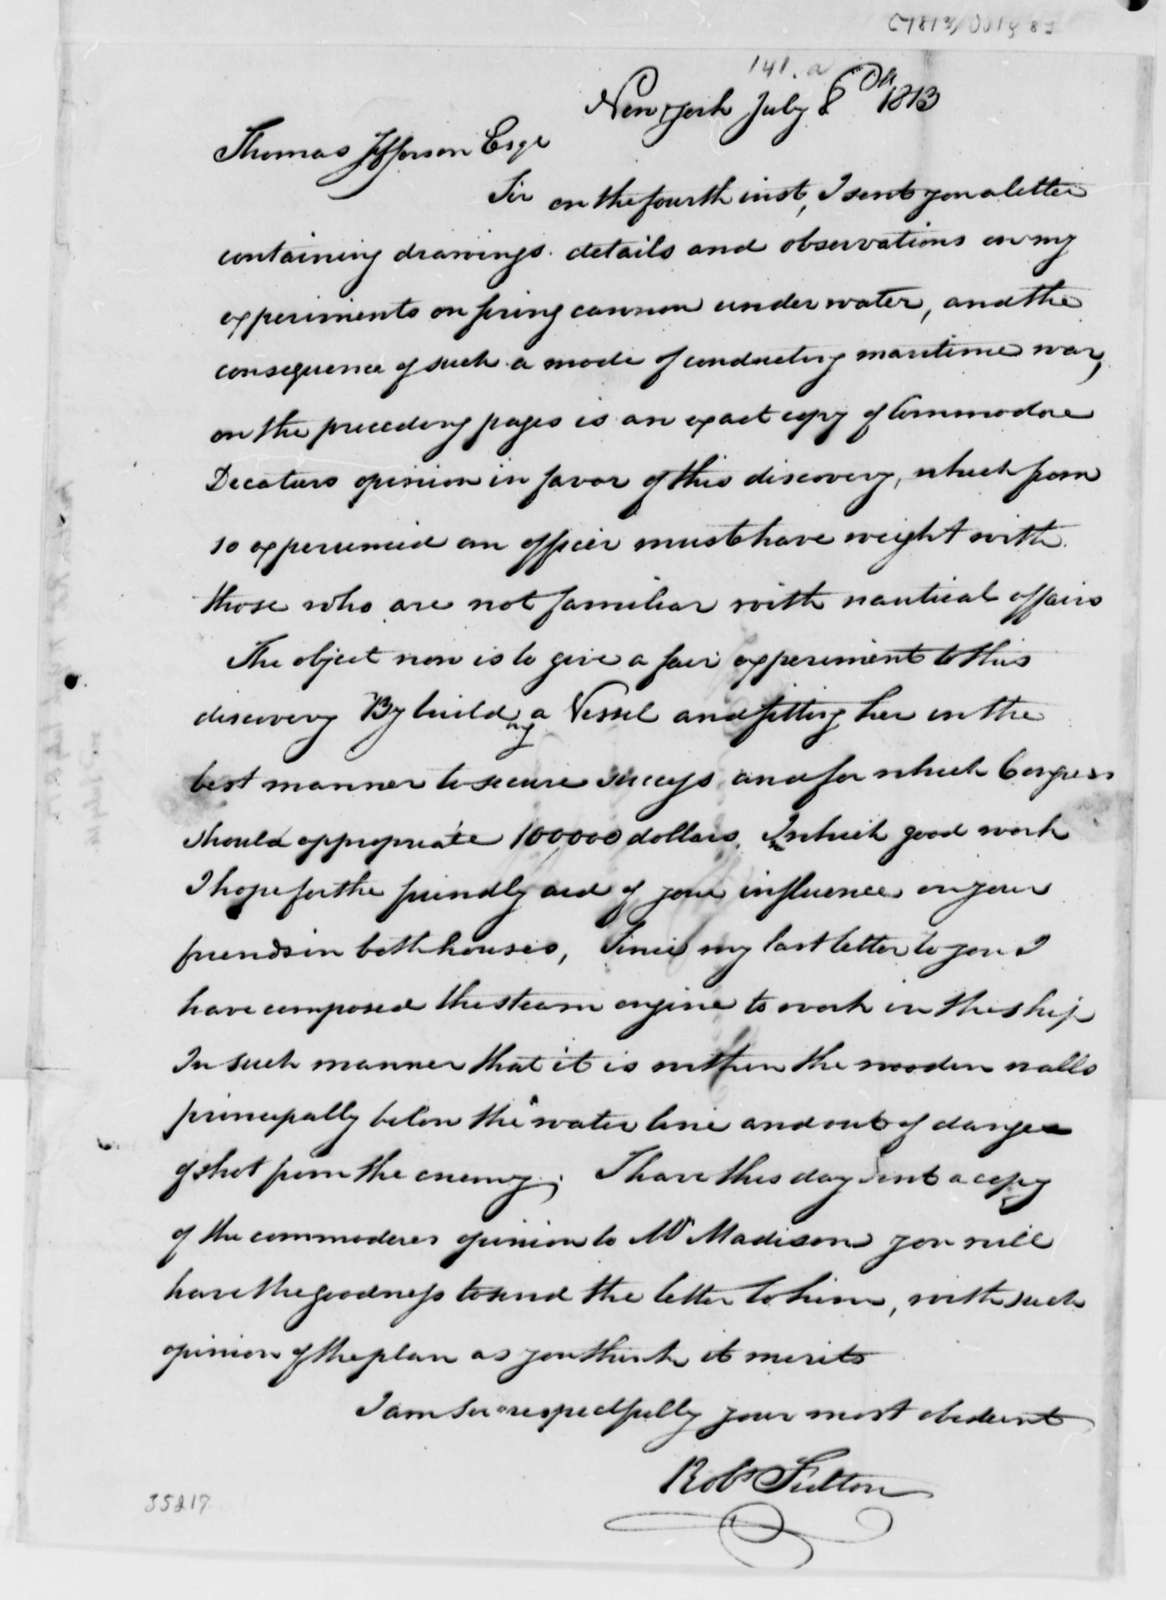 Robert Fulton to Thomas Jefferson, July 8, 1813